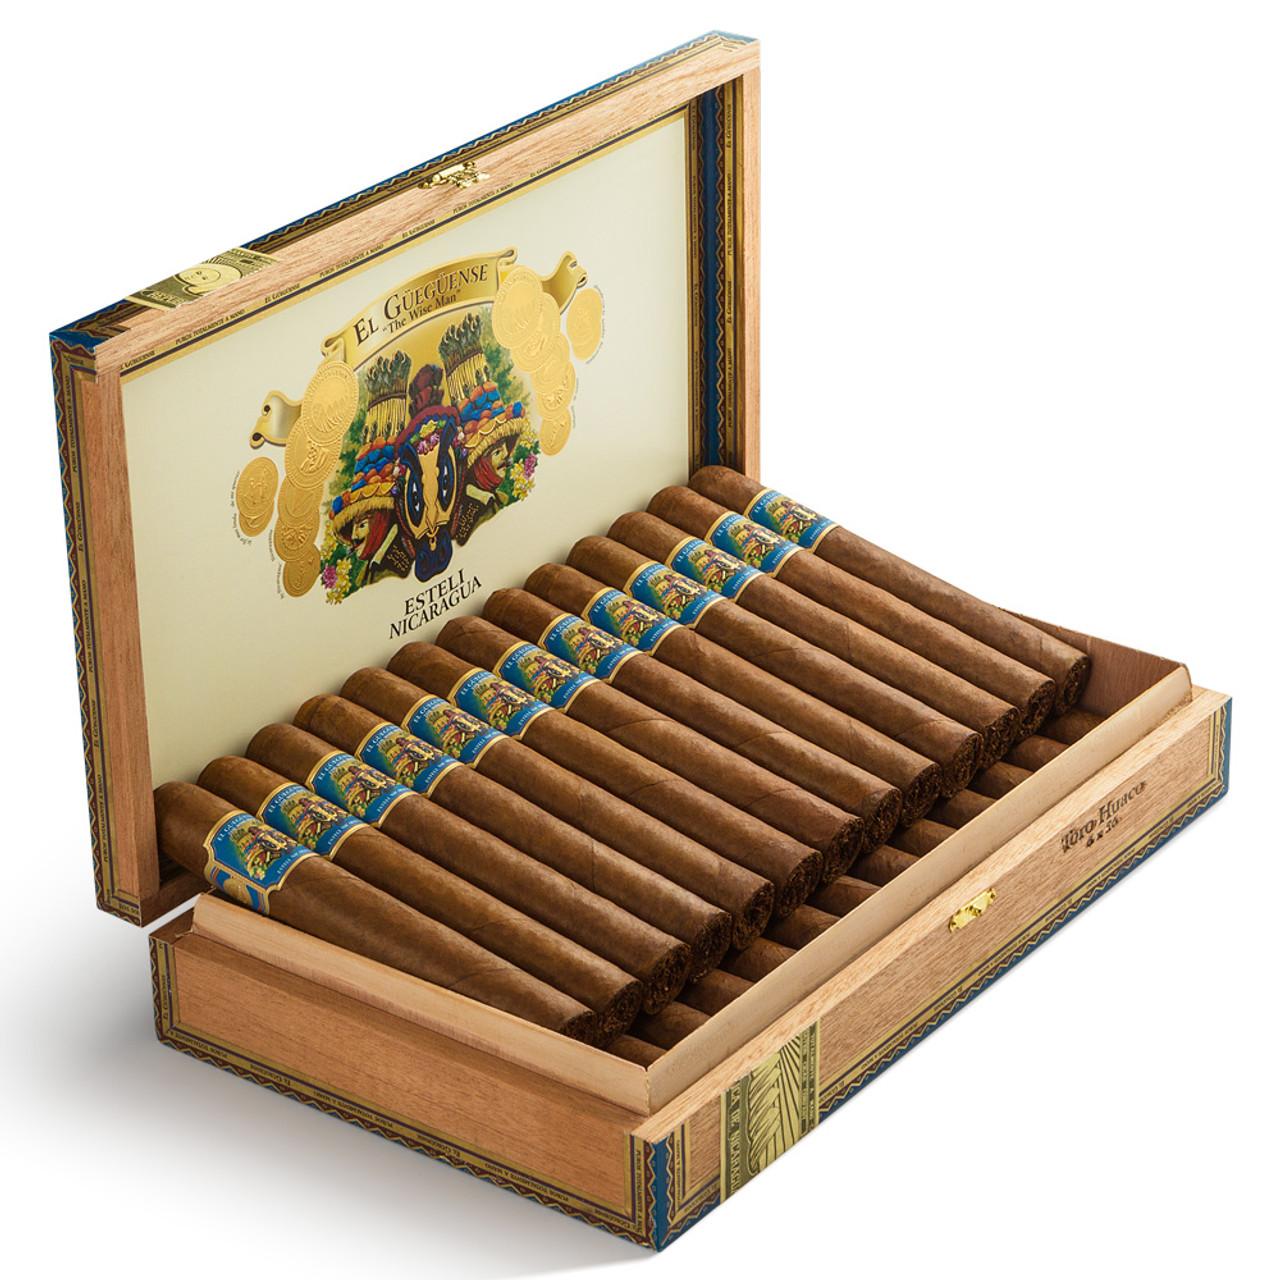 Foundation El Gueguense Torpedo Cigars - 6.25 x 52 (Box of 25)